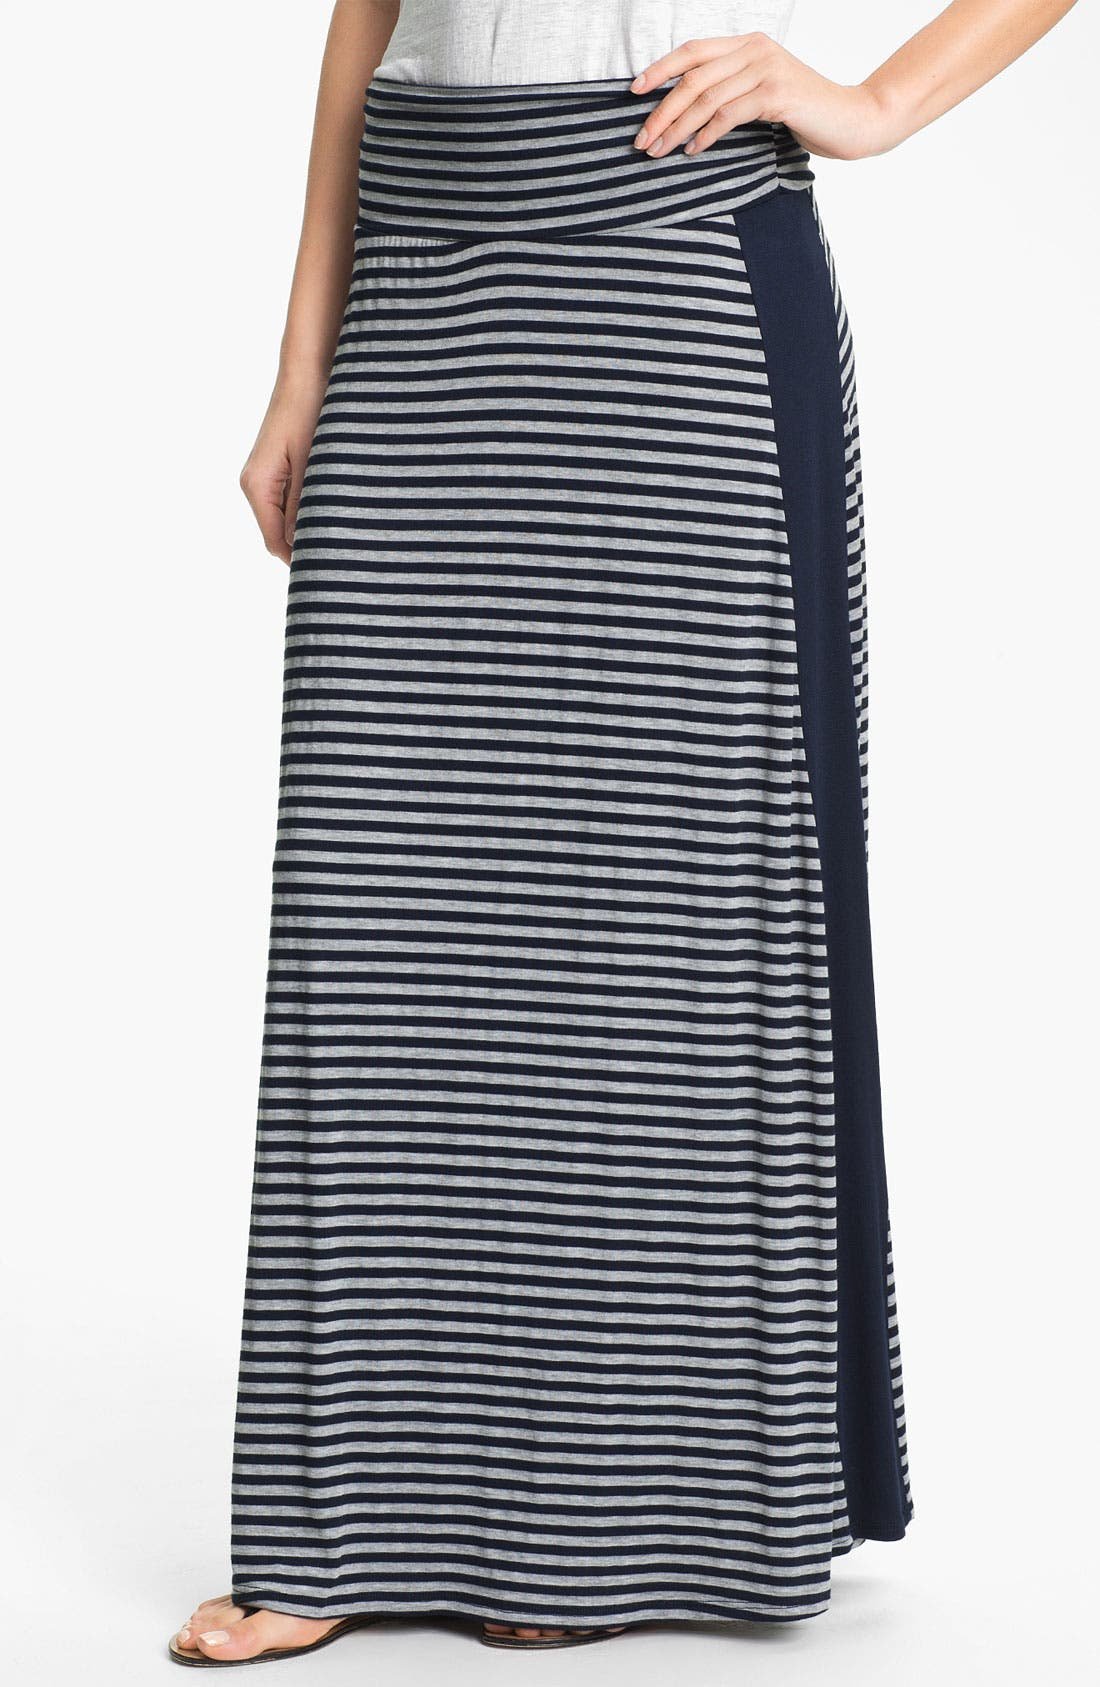 Main Image - Bobeau Tuxedo Stripe Maxi Skirt